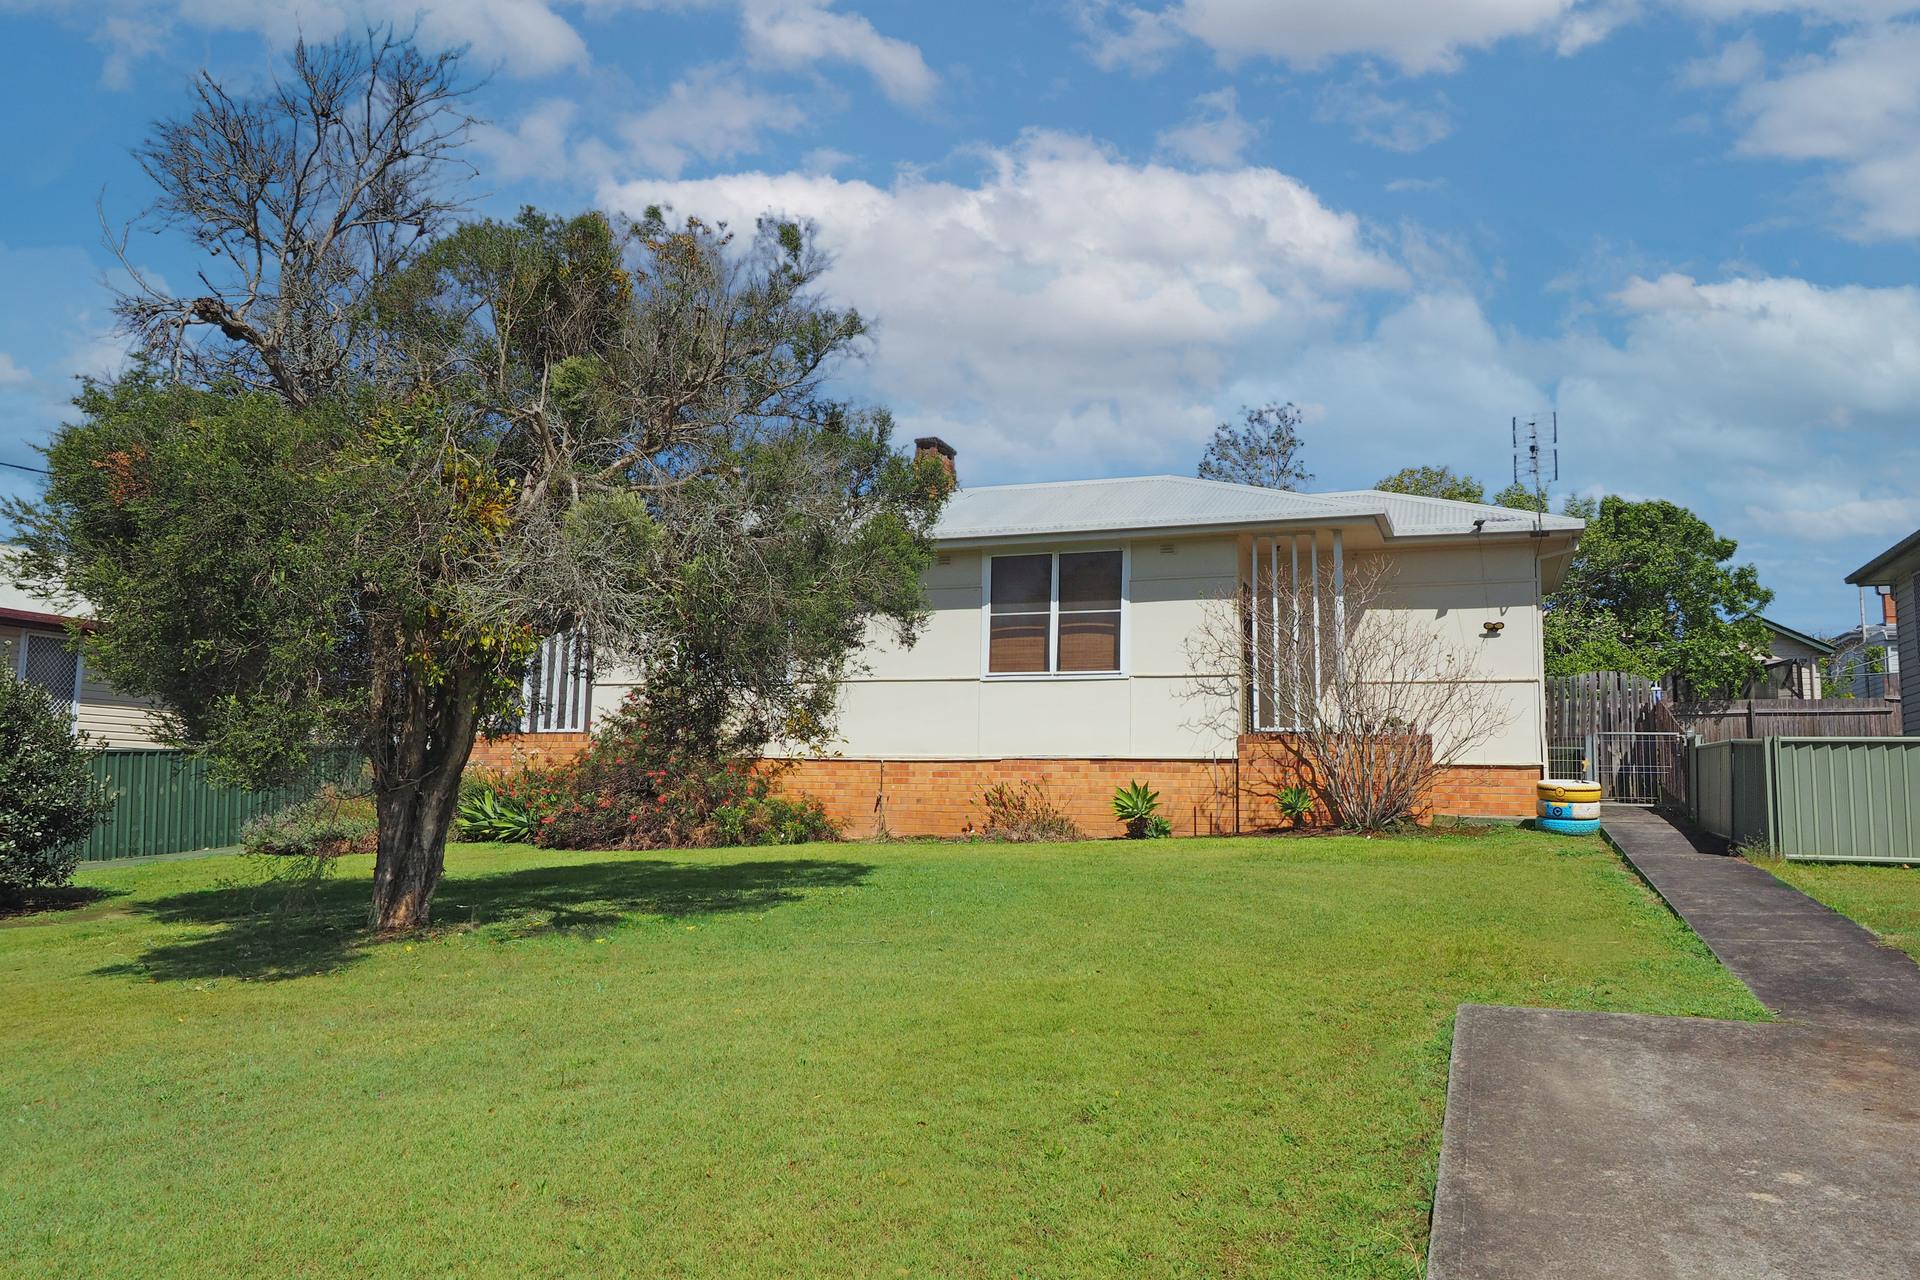 23B Neville Everson Street, West Kempsey, NSW, 2440 - Image 1